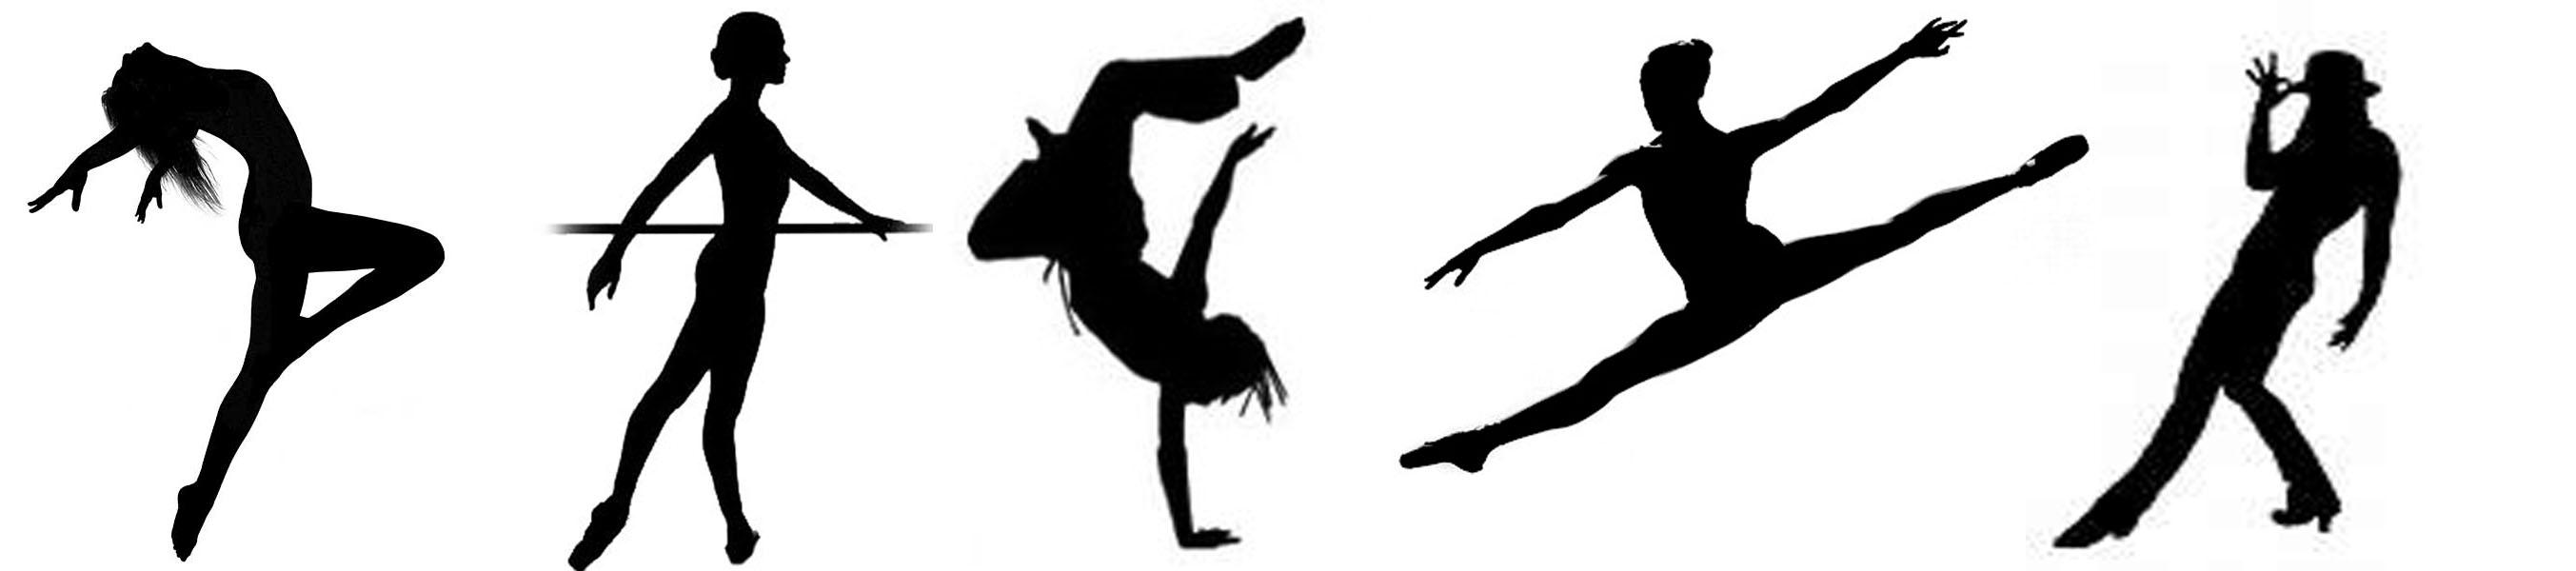 2706x600 Dance Is A Sport